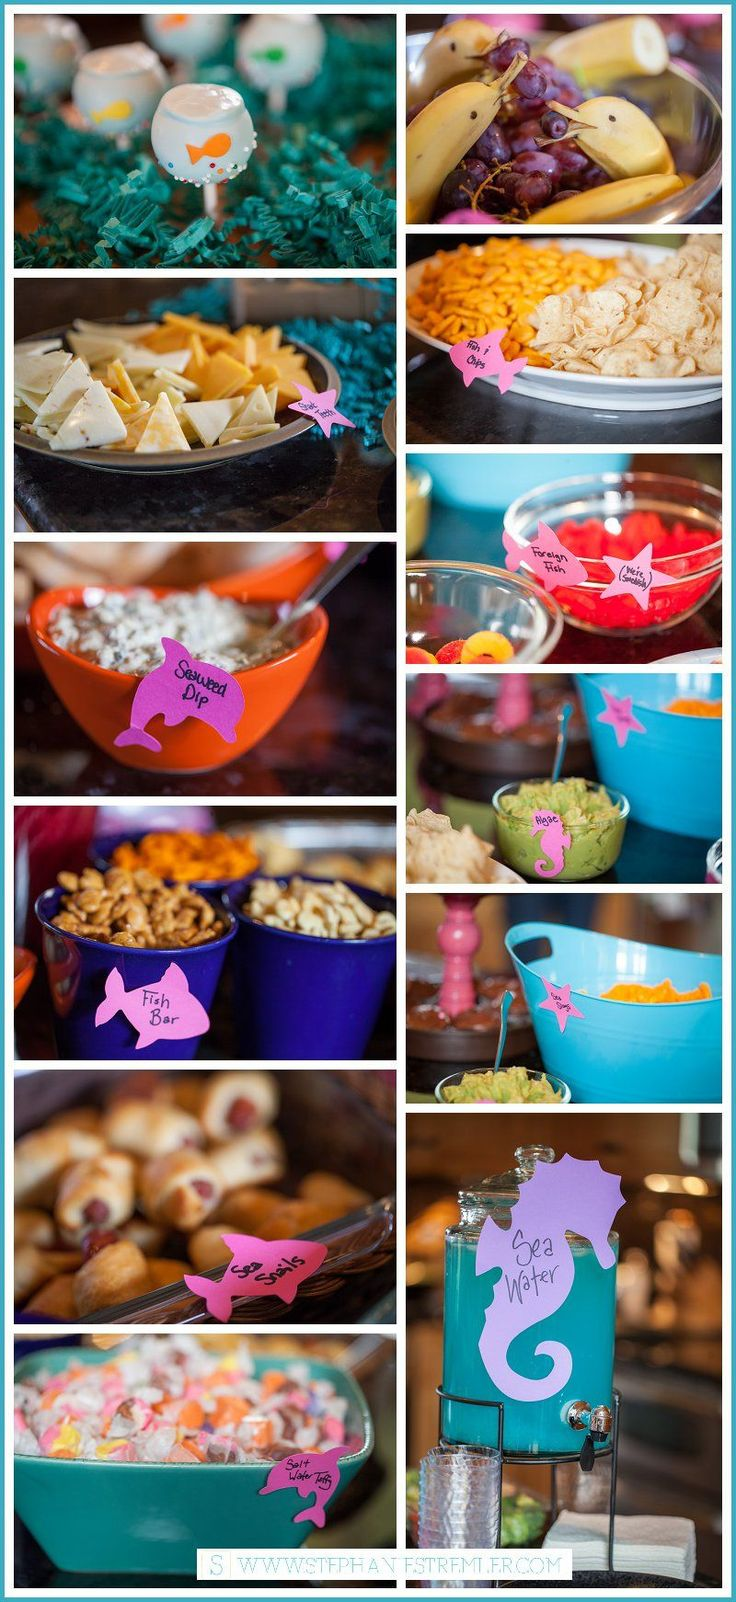 List of Party Food for Sea, Ocean, Beach or Pool Party | Sea Life | Ocean | Beach | Bubble Guppies | Birthday Party | Theme Party | Stephanie Stremler Photography | www.stephaniestremler.com